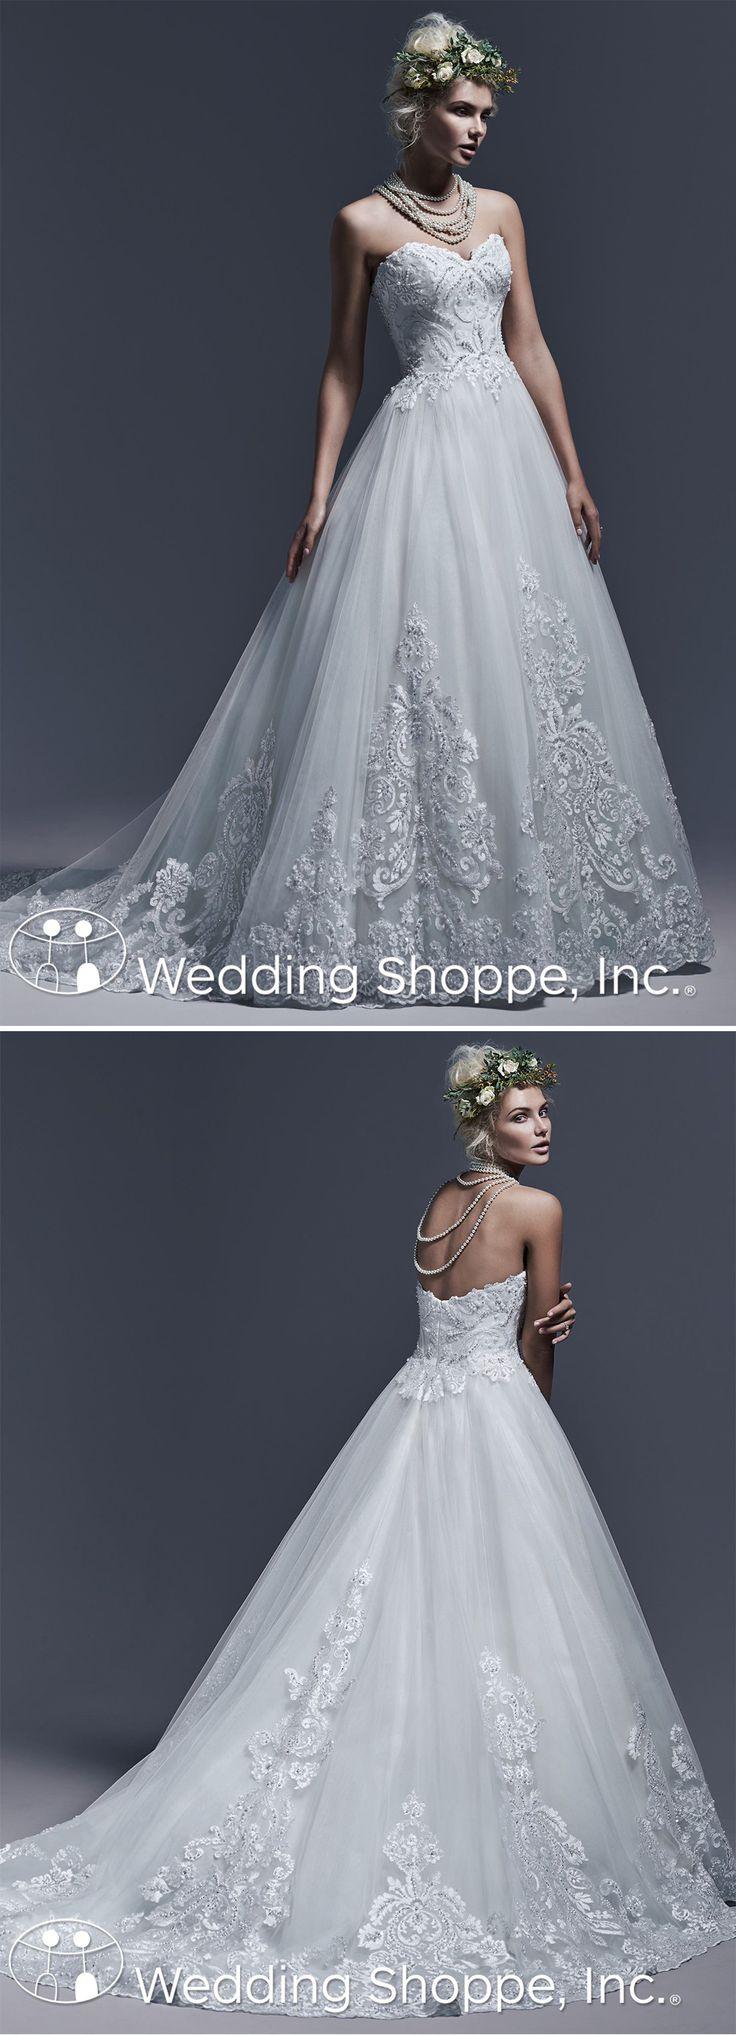 vintage wedding dress strapless sequins beads embroider flowy train